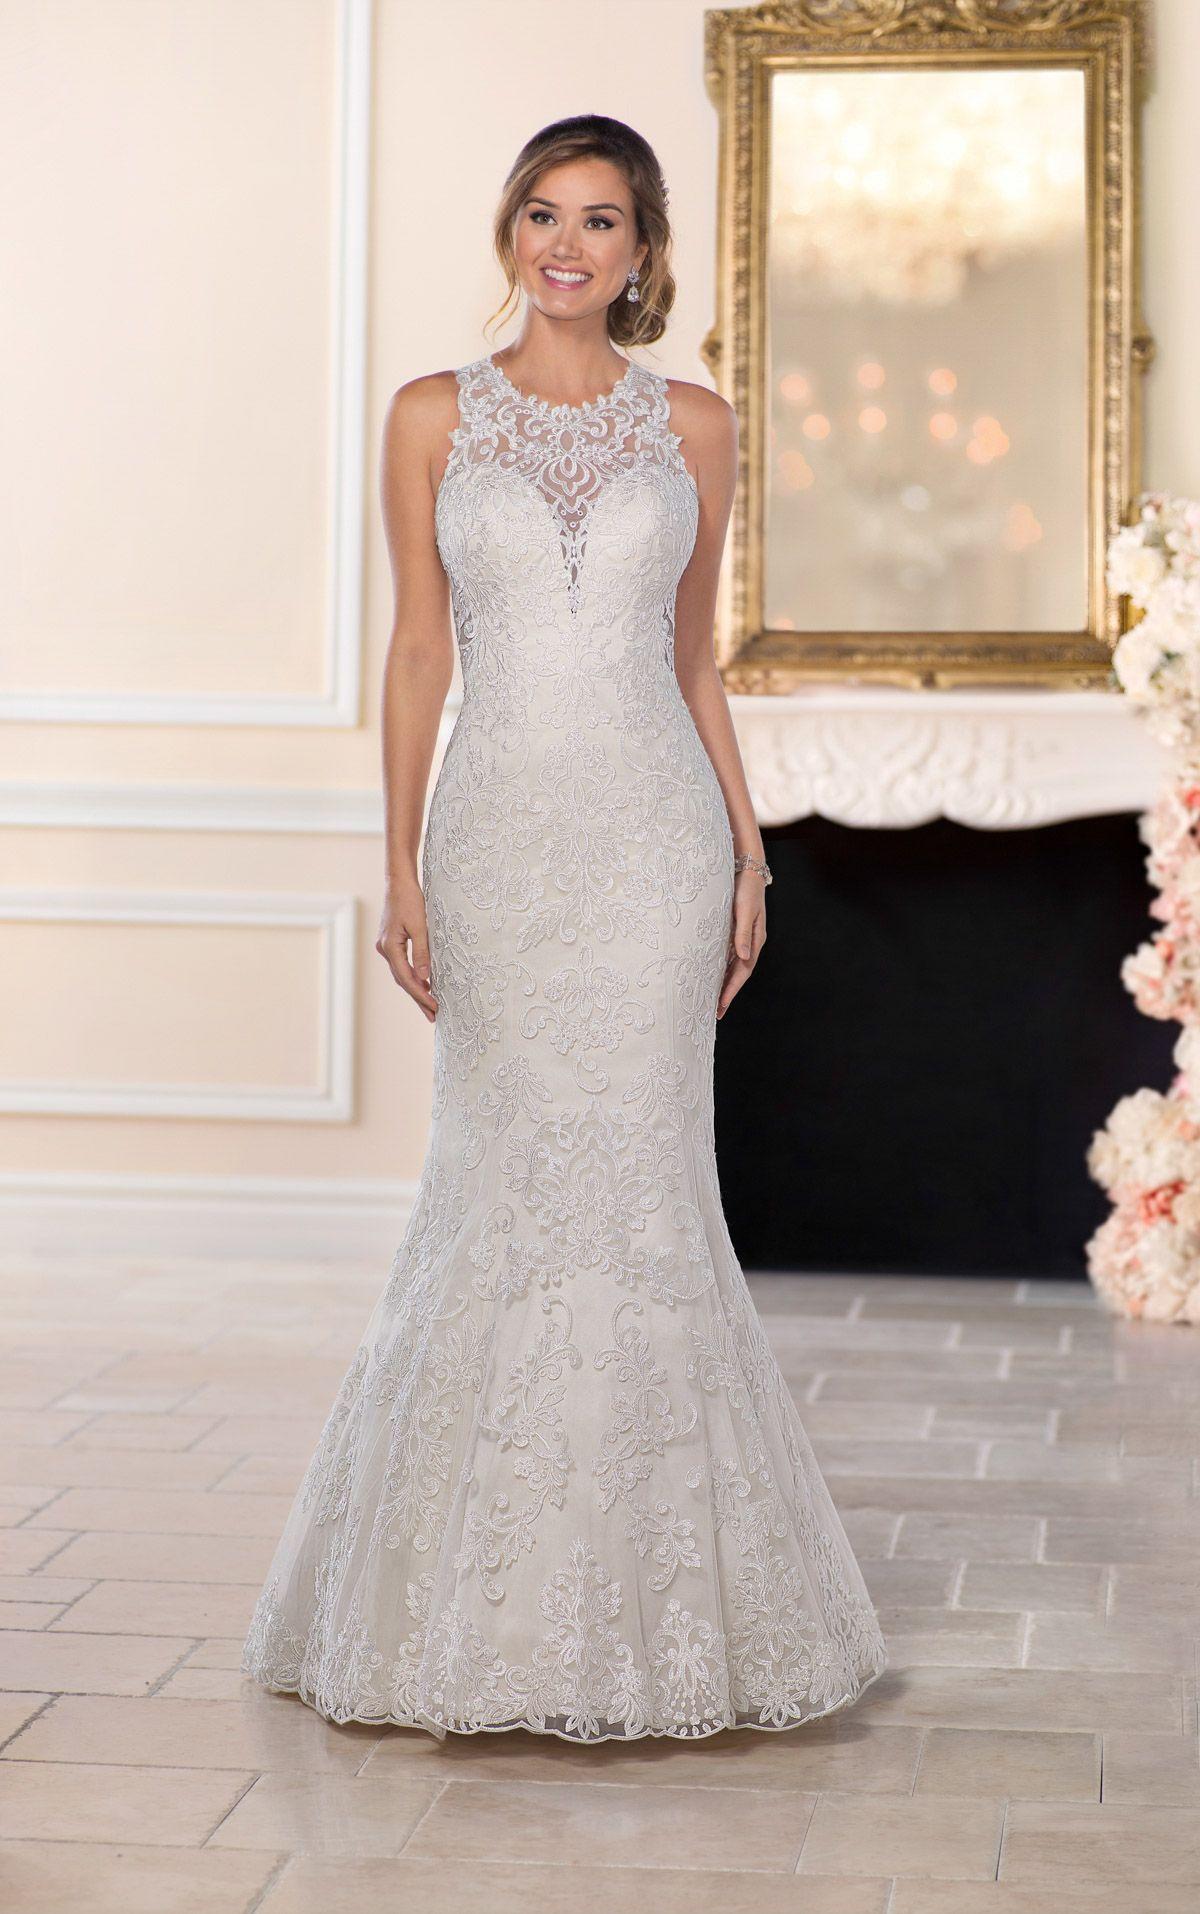 Lace dress styles for wedding  Lace Wedding Dresses  Watkins Wedding  Pinterest  Stella york